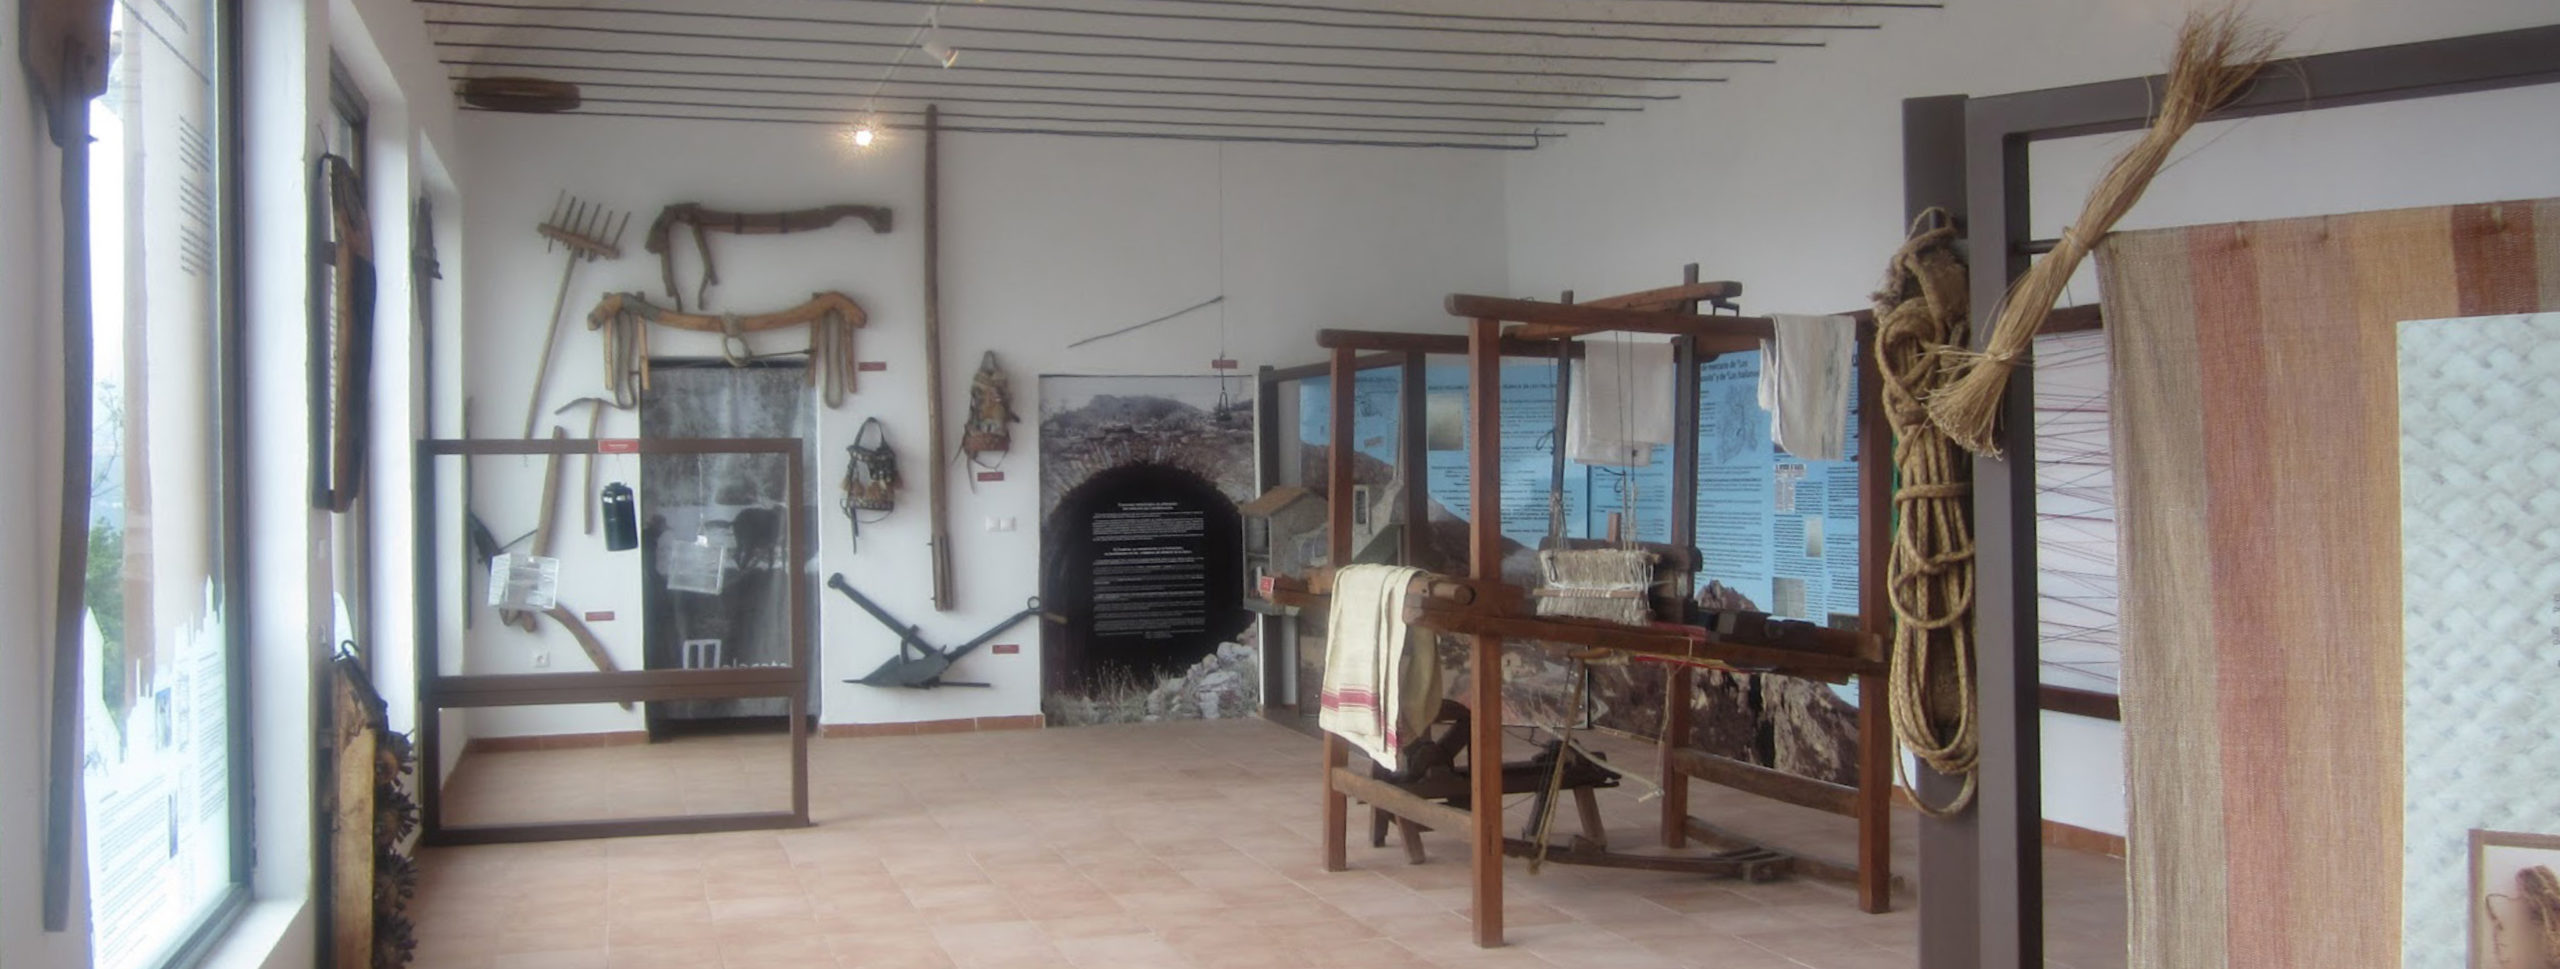 Museo Malacate